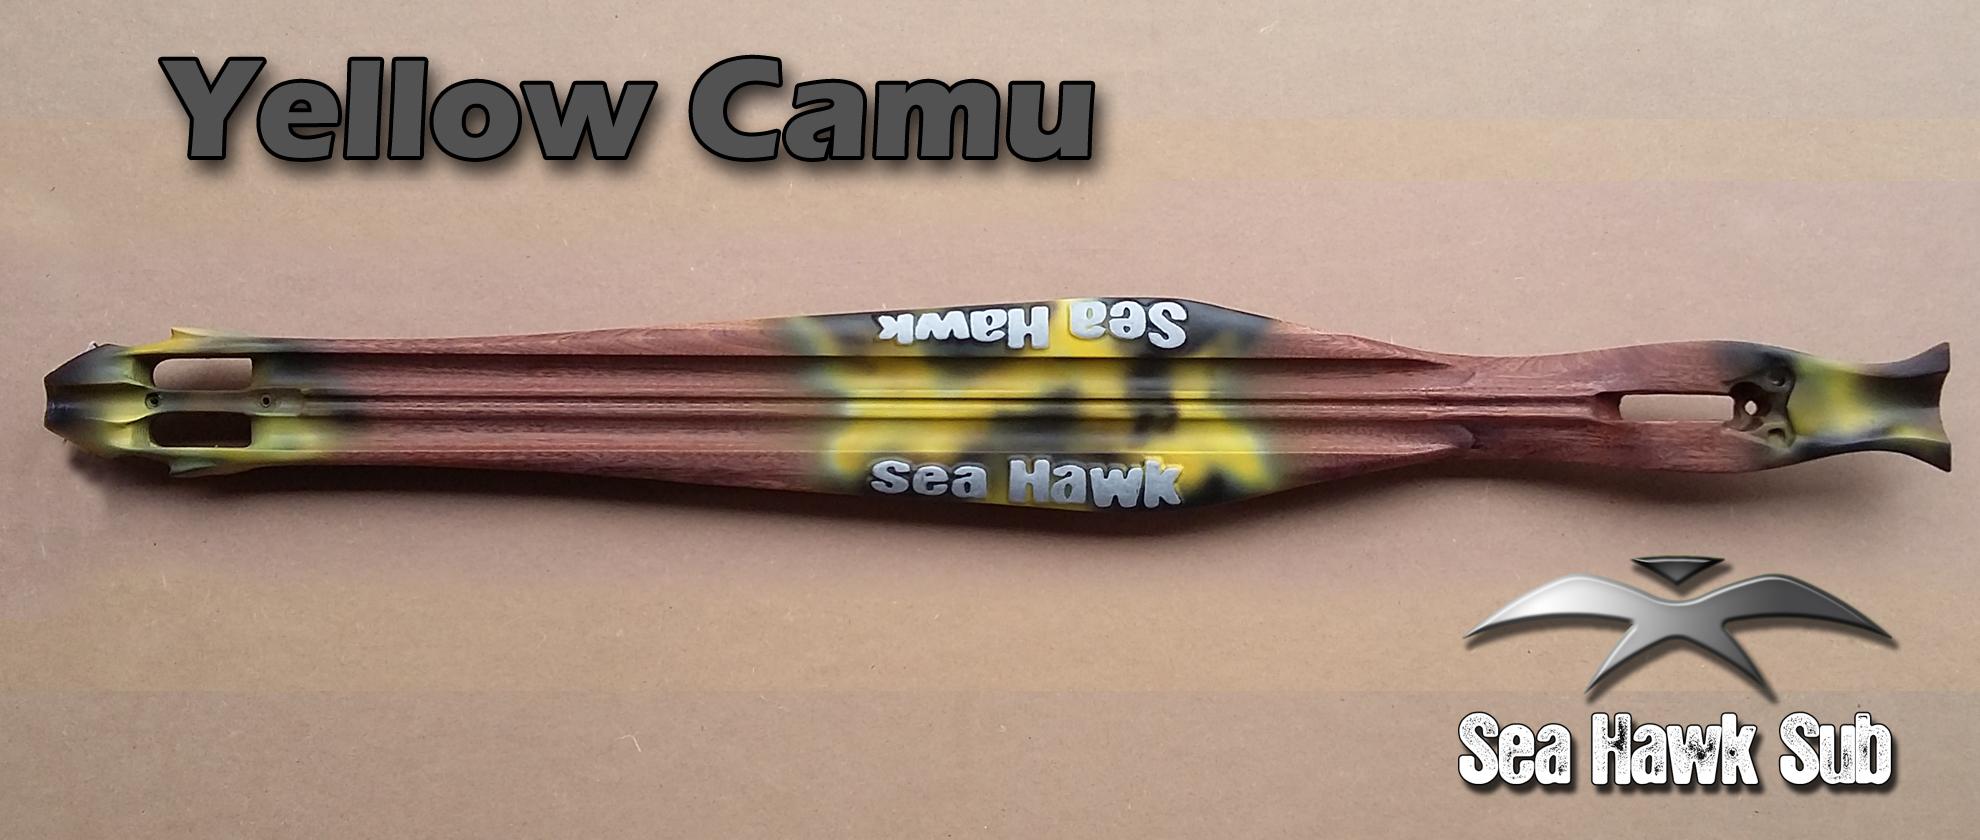 Yellow Camu